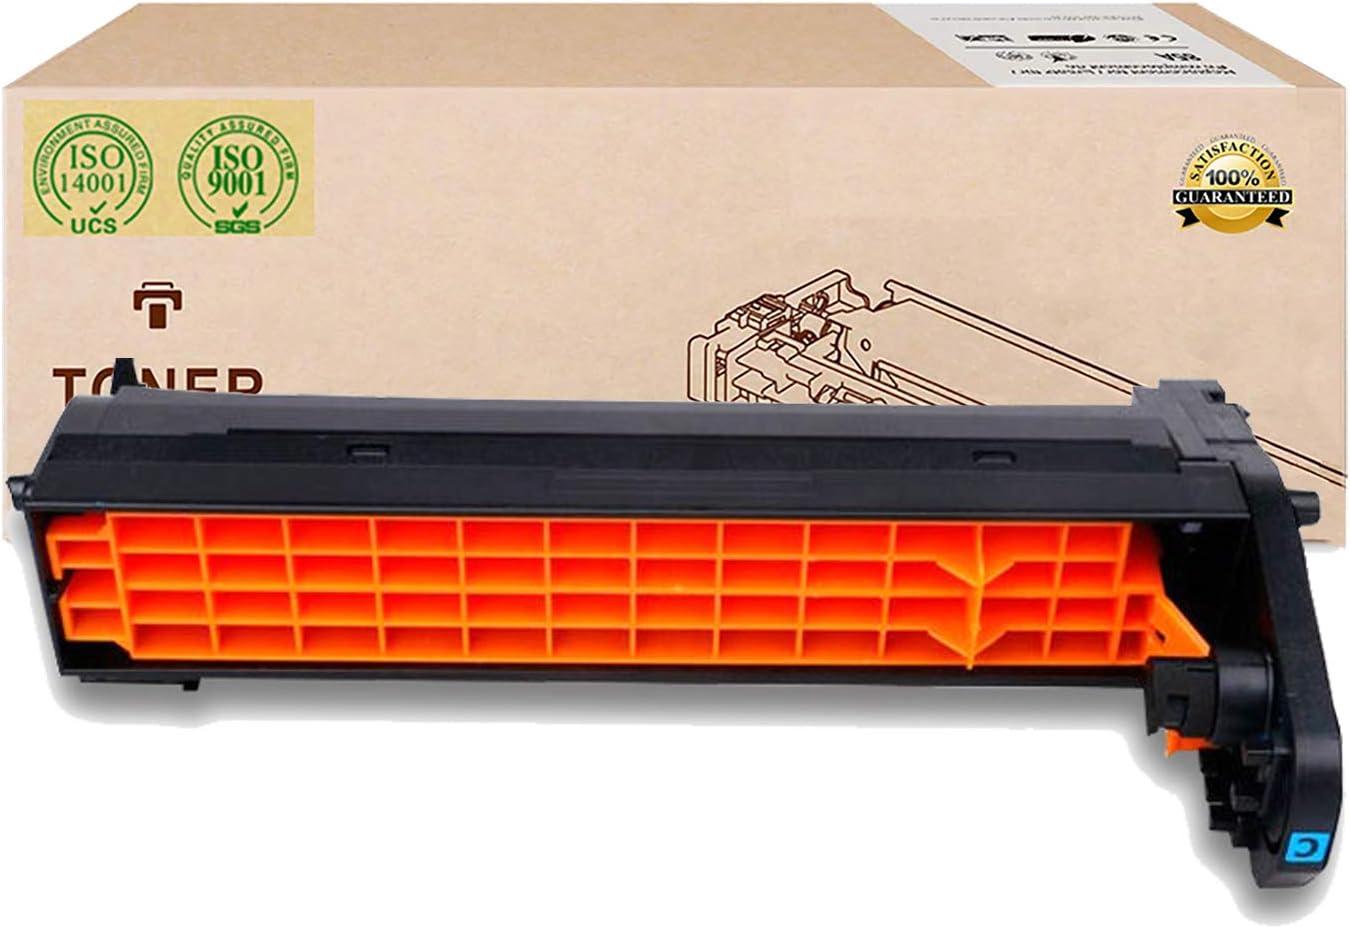 Compatible Drum Unit Replacement for OKI C9800 Drum Unit for OKI Docucentre C9600 C9650 C9800 C9850 Laser Printer,Yellow